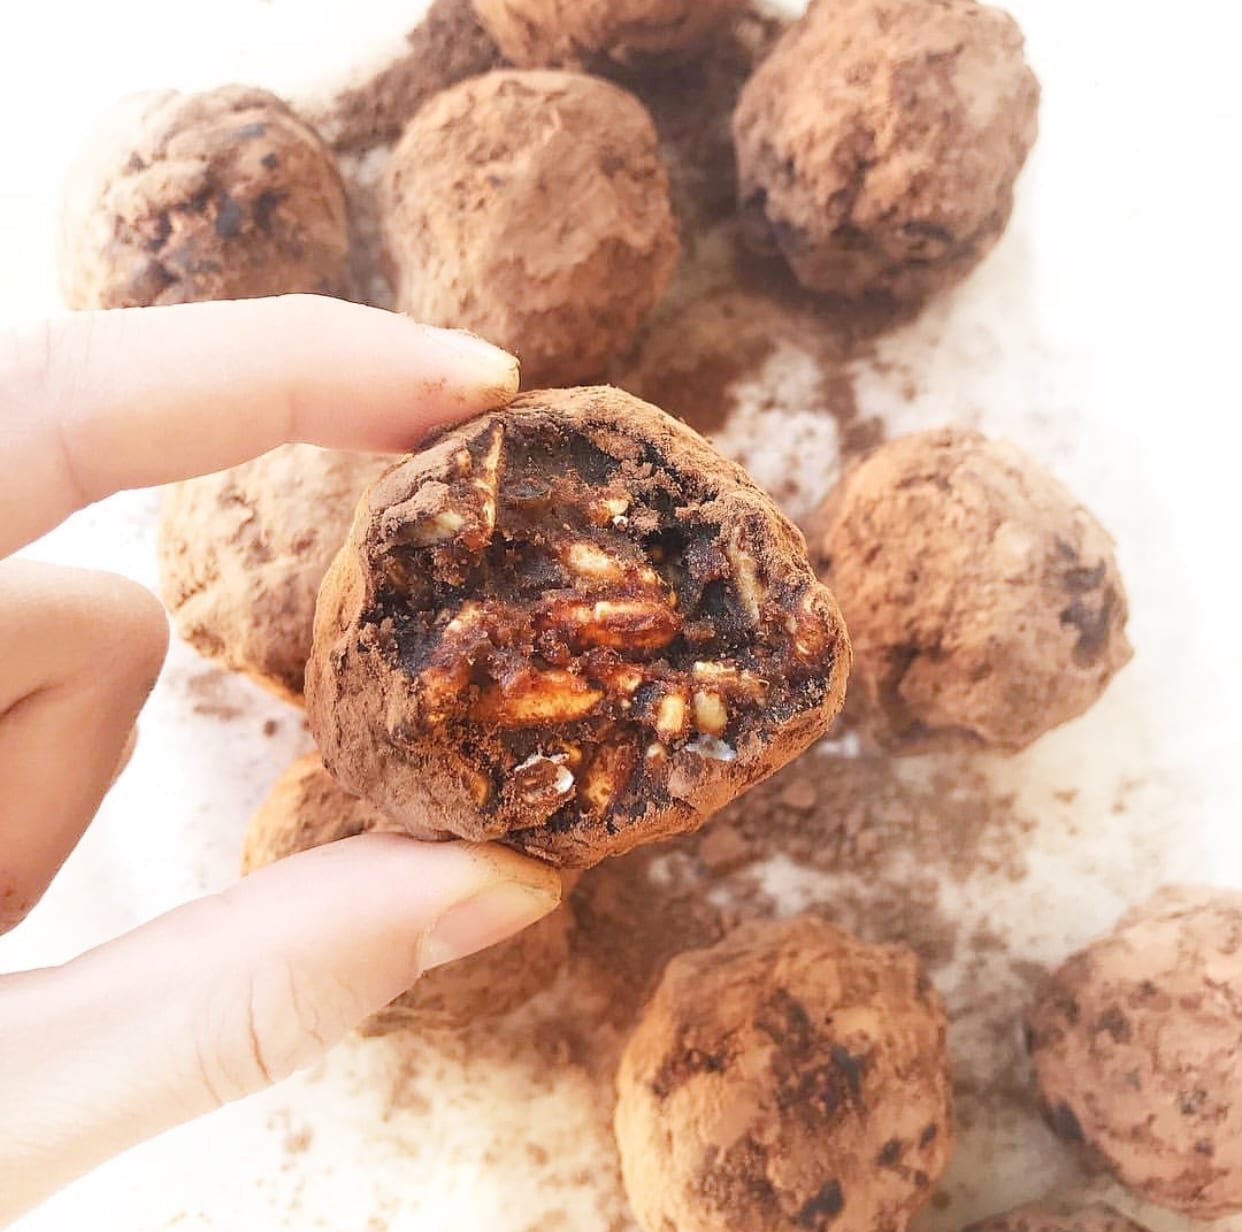 Crispy Peanut Butter & Chocolate Truffles